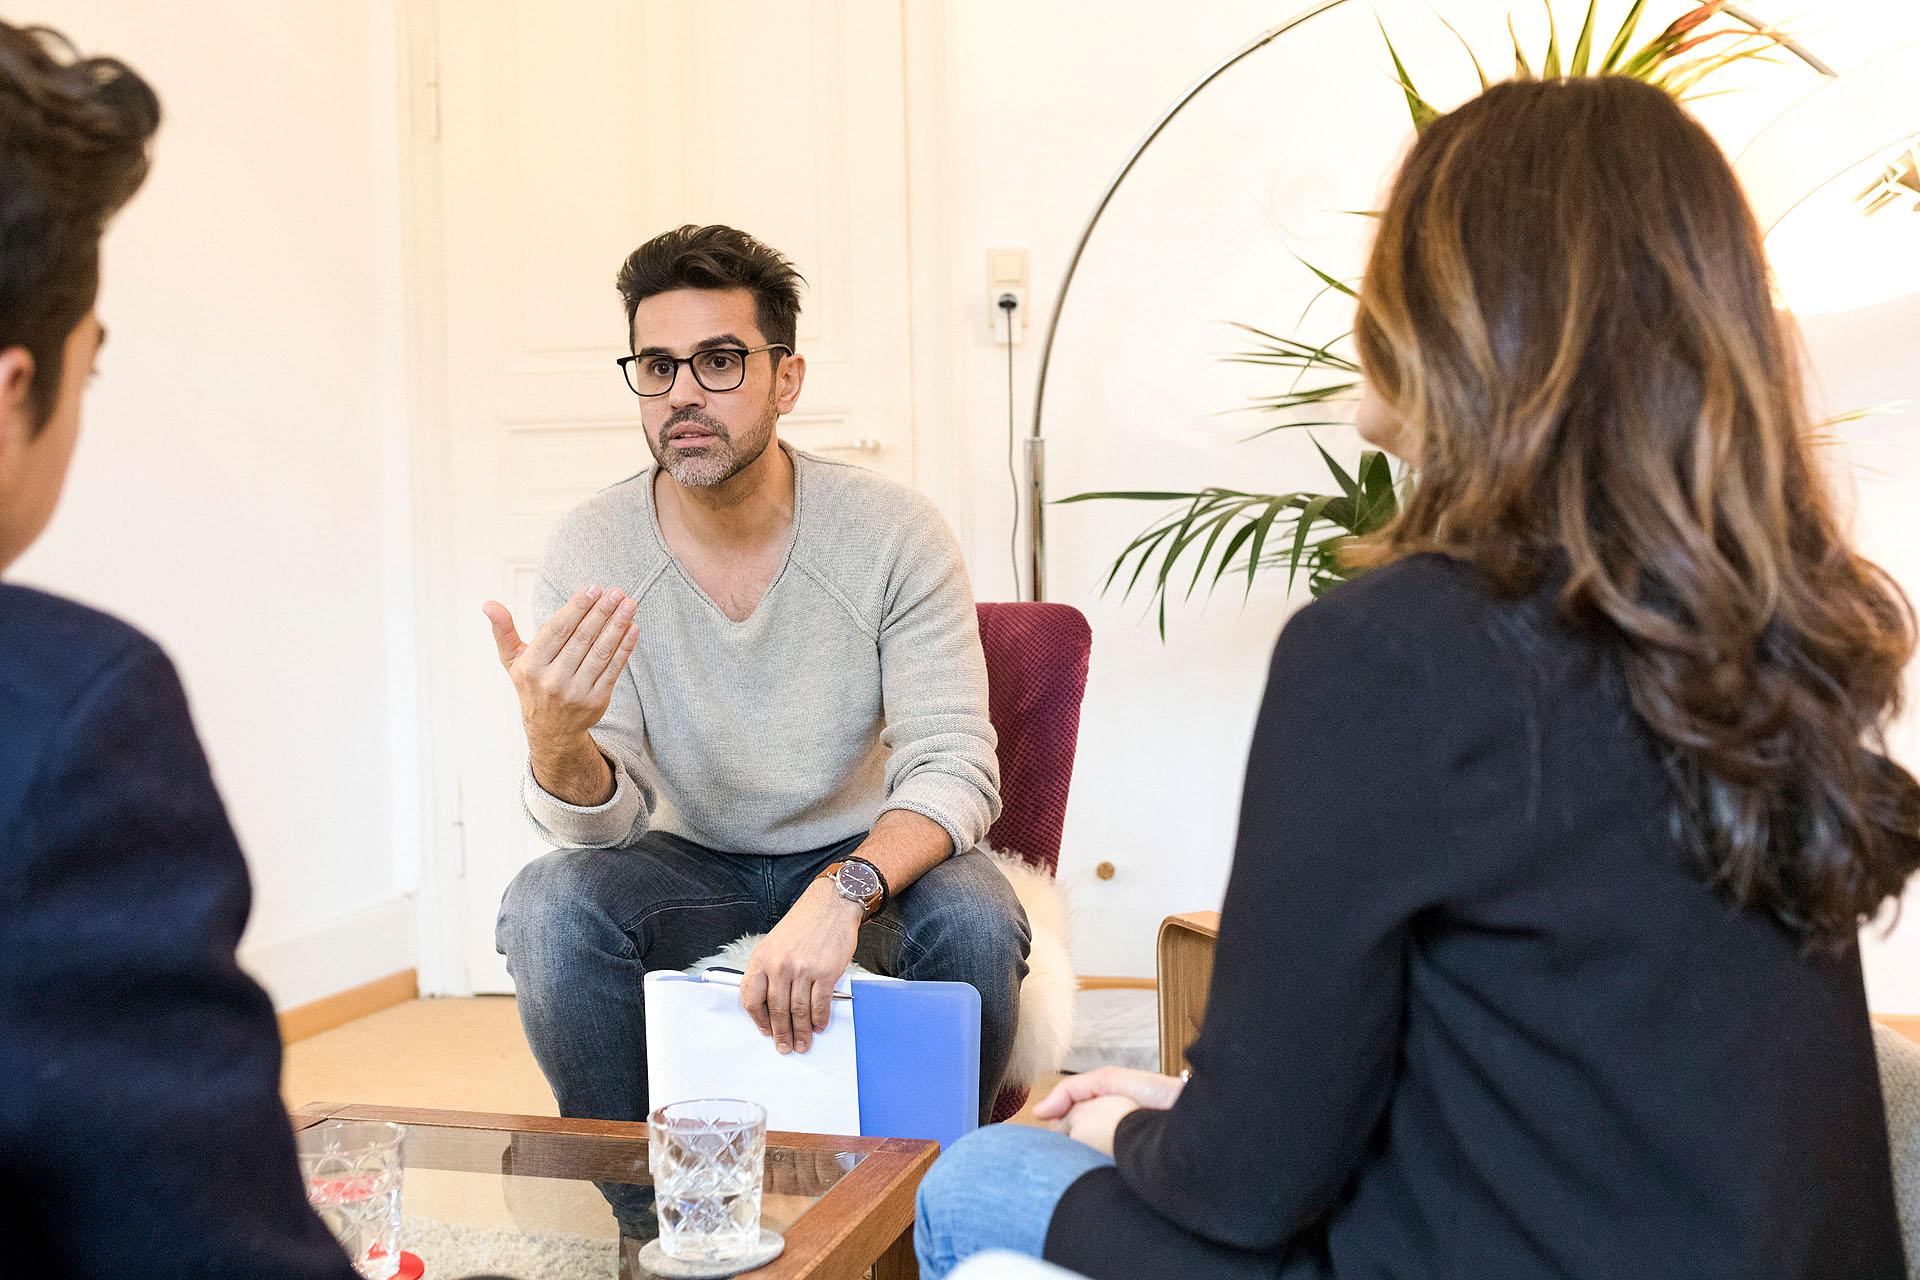 Stuttgart Luis Kimyon Paartherapie Eheberatung